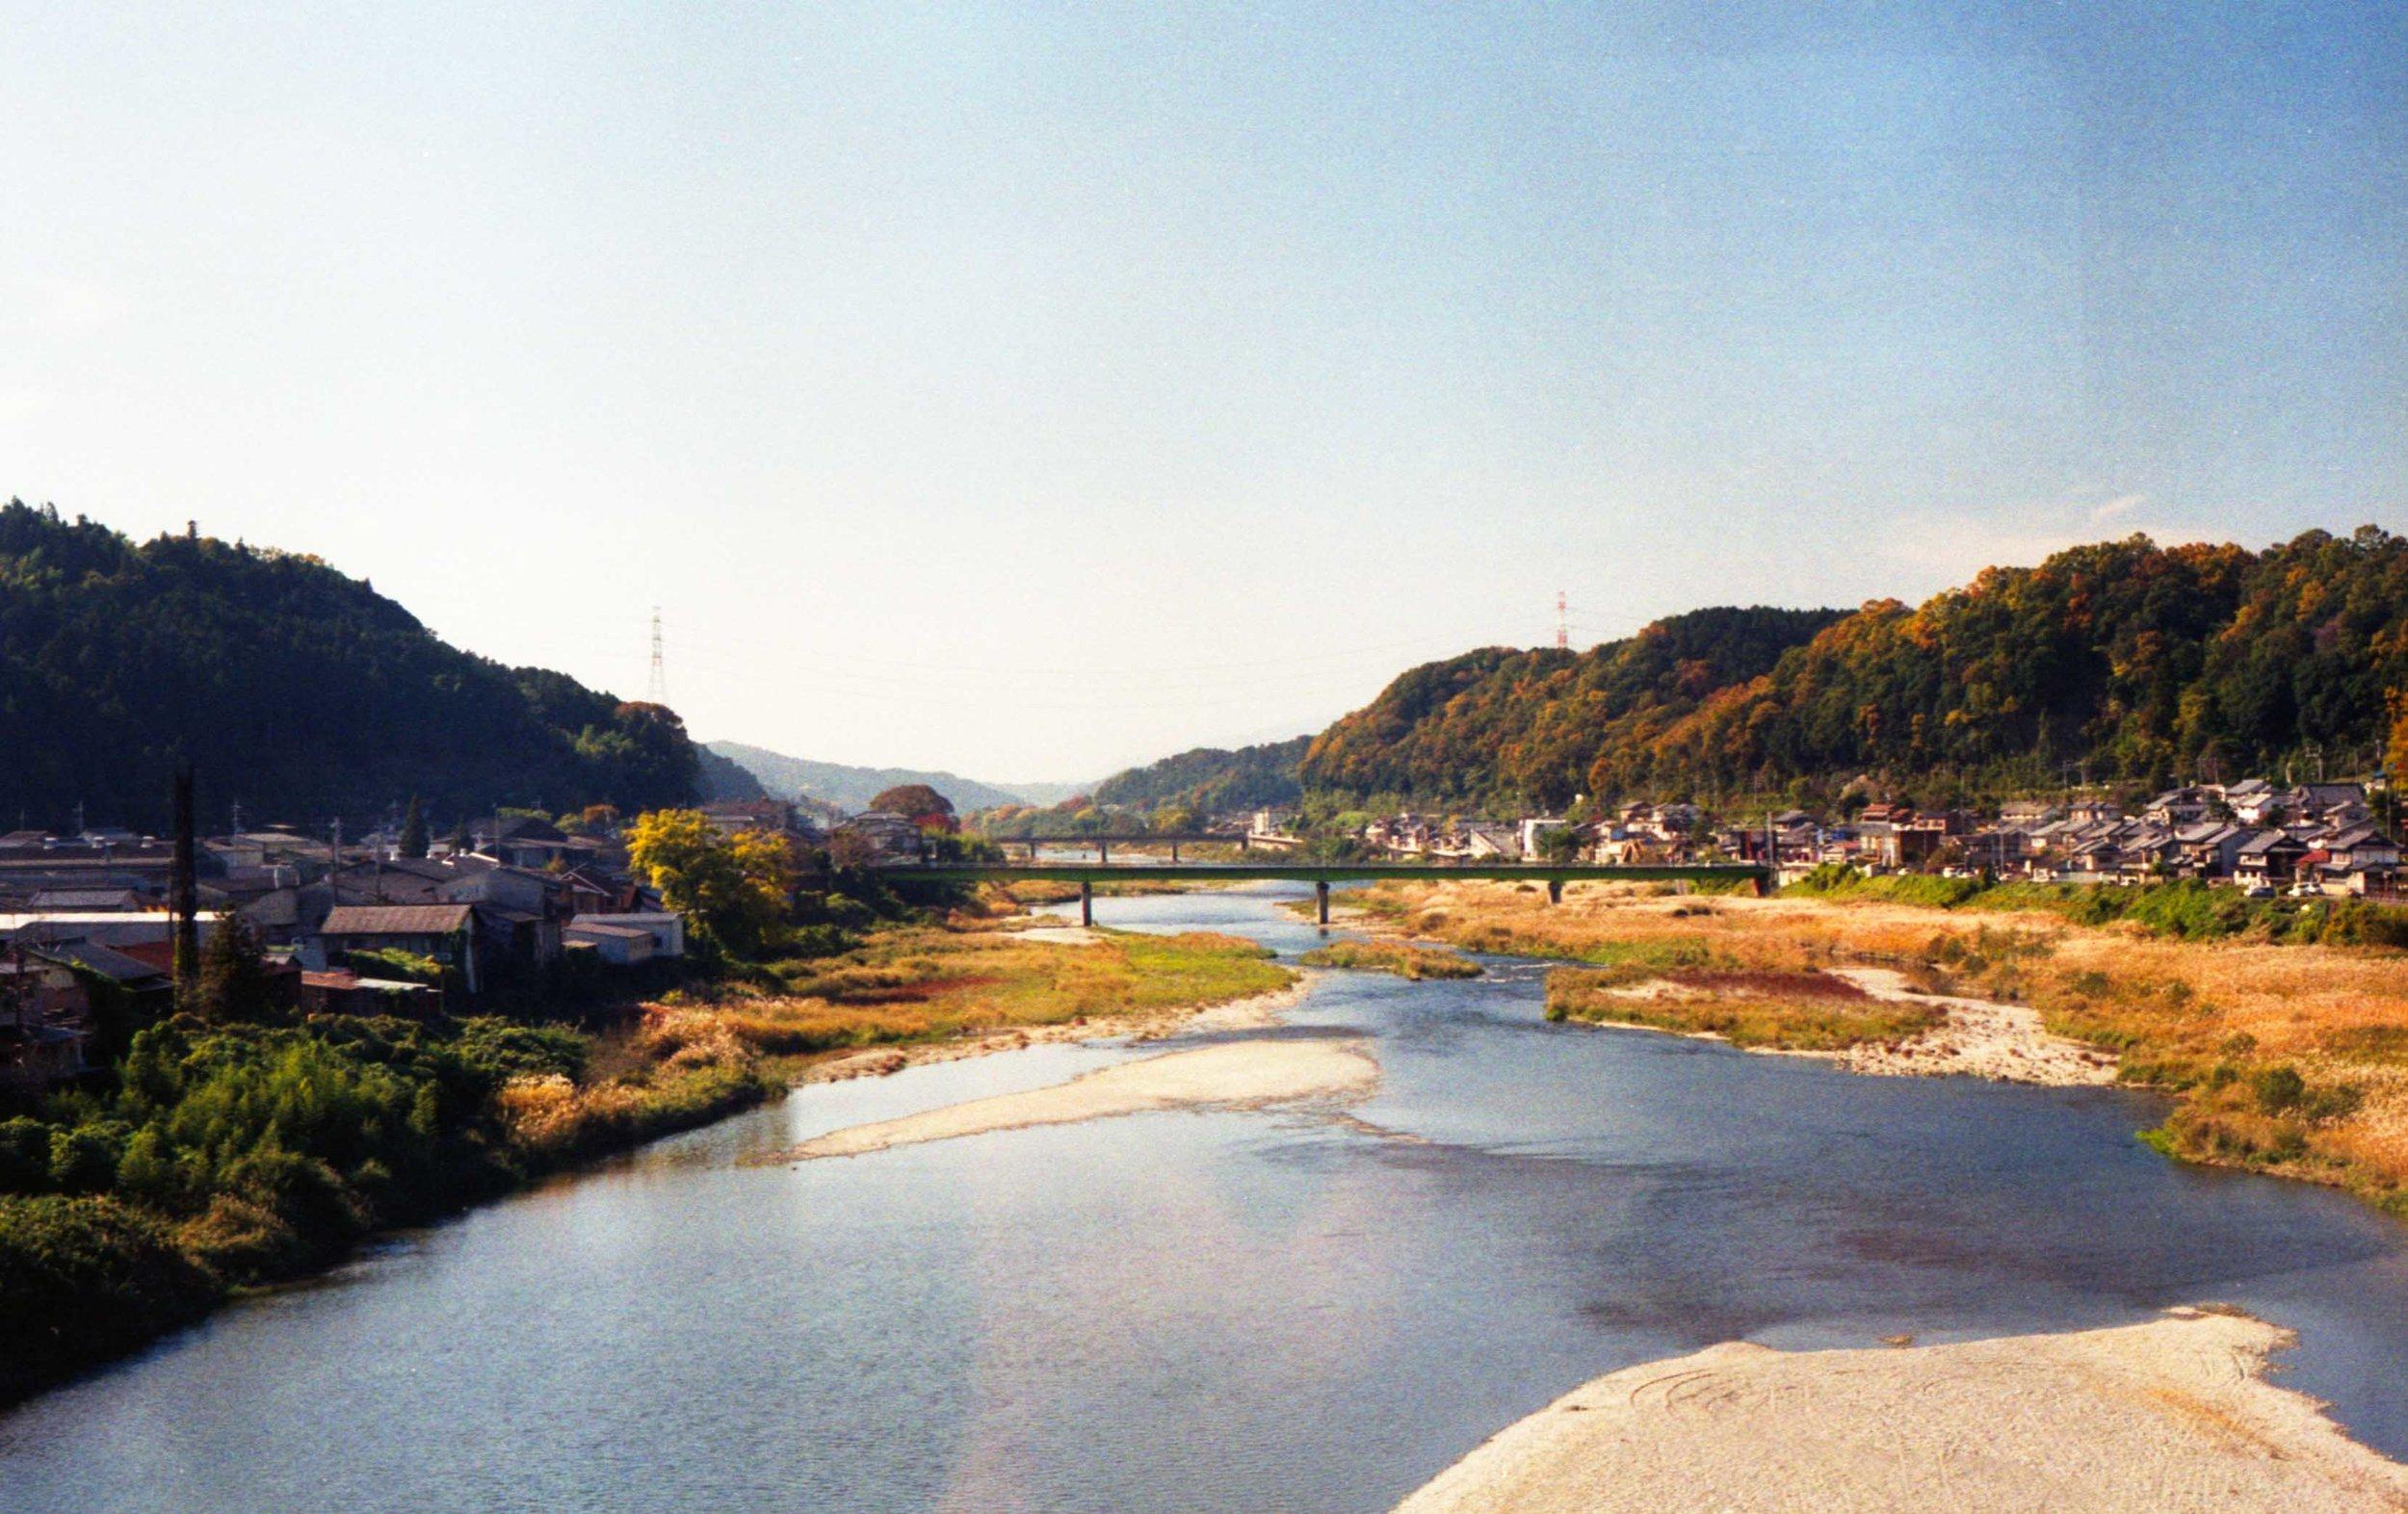 「吉野川(Riv.Yoshino)」